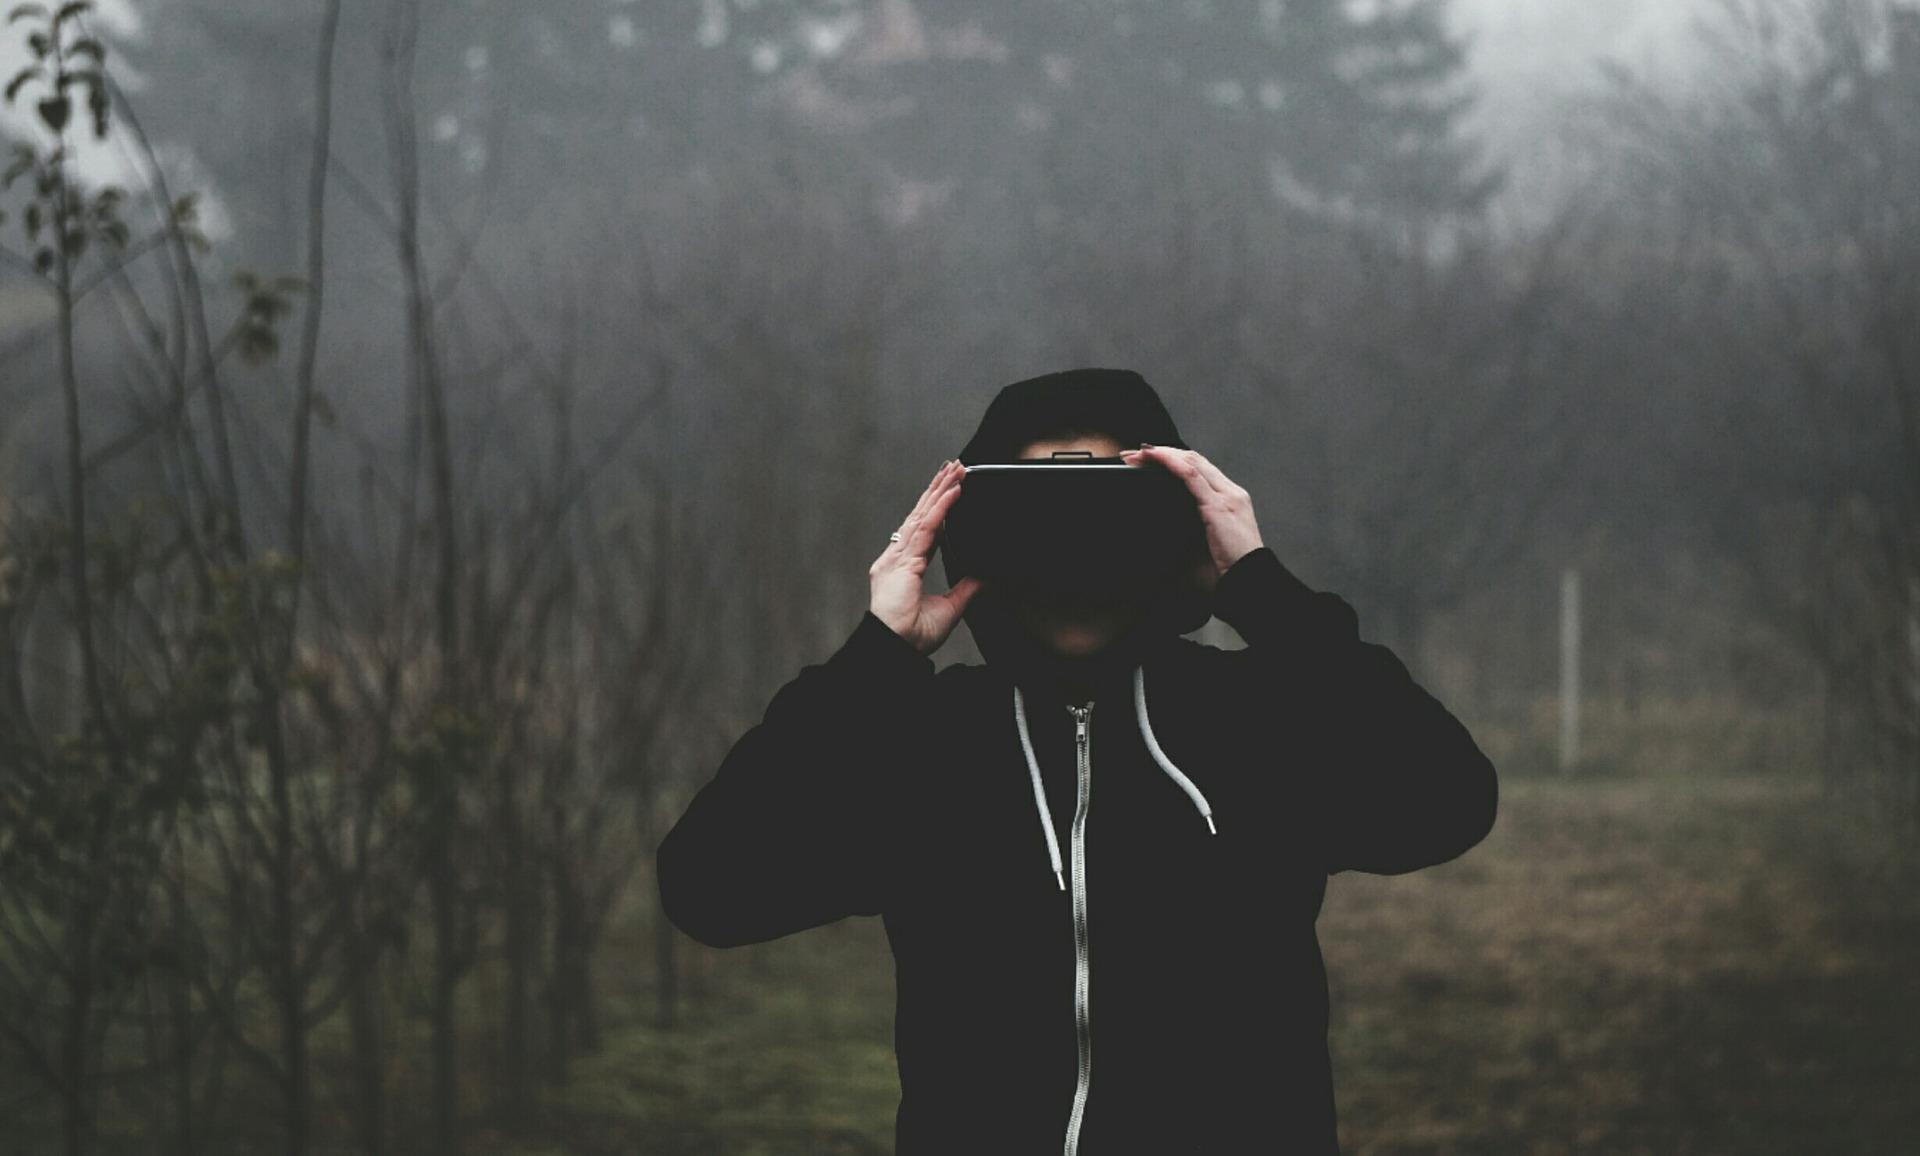 360 degrees videos